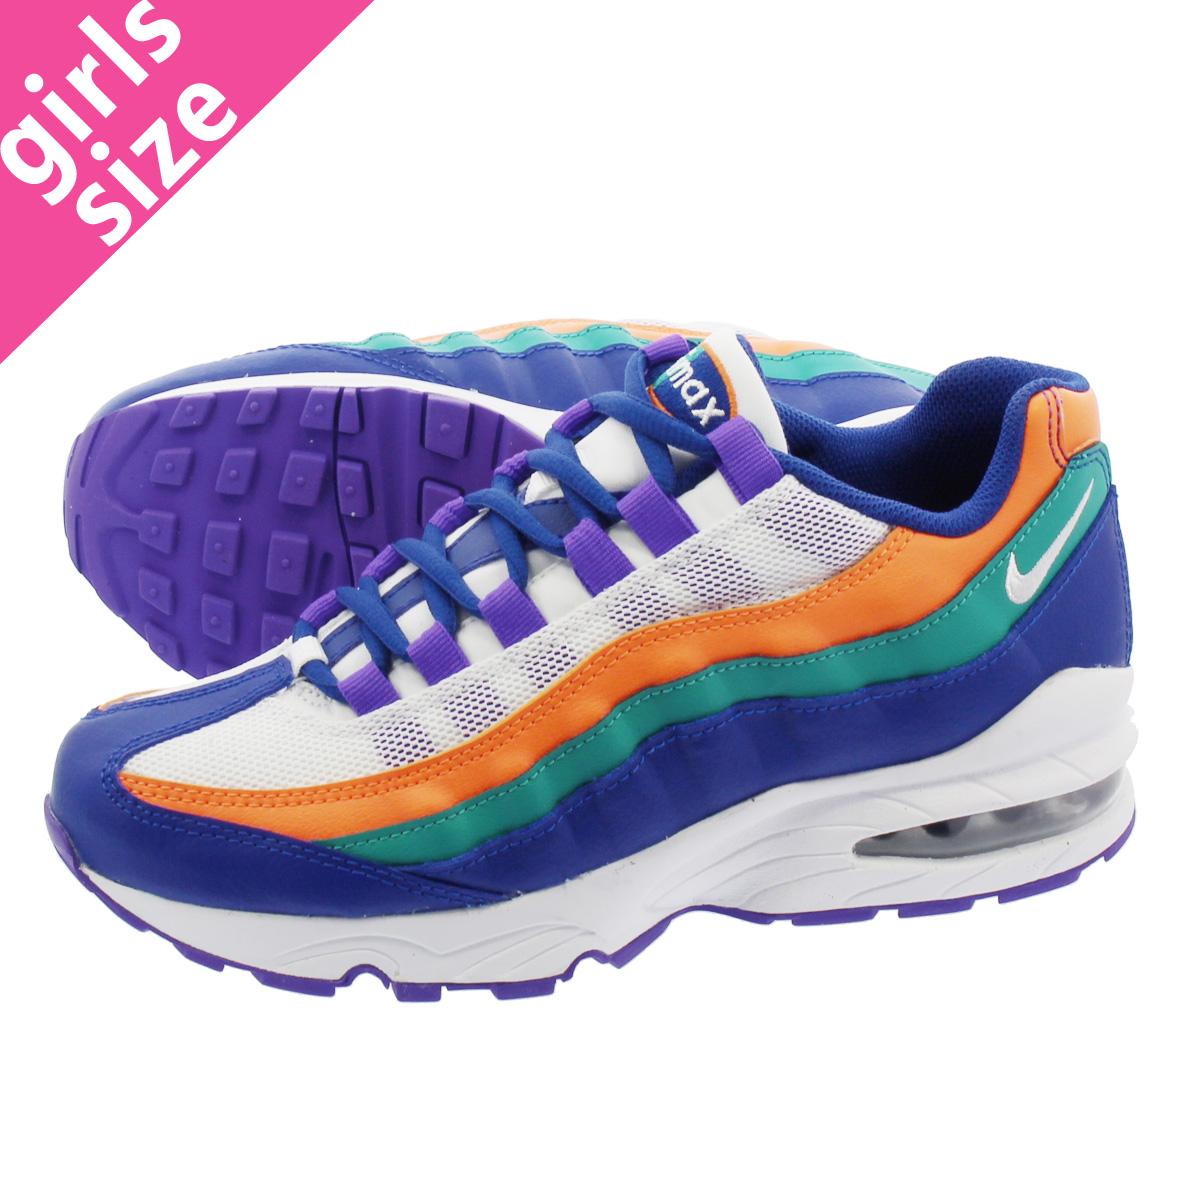 c384382f38c ... wholesale nike air max 95 gs kie ney amax 95 gs white blue purple green  orange